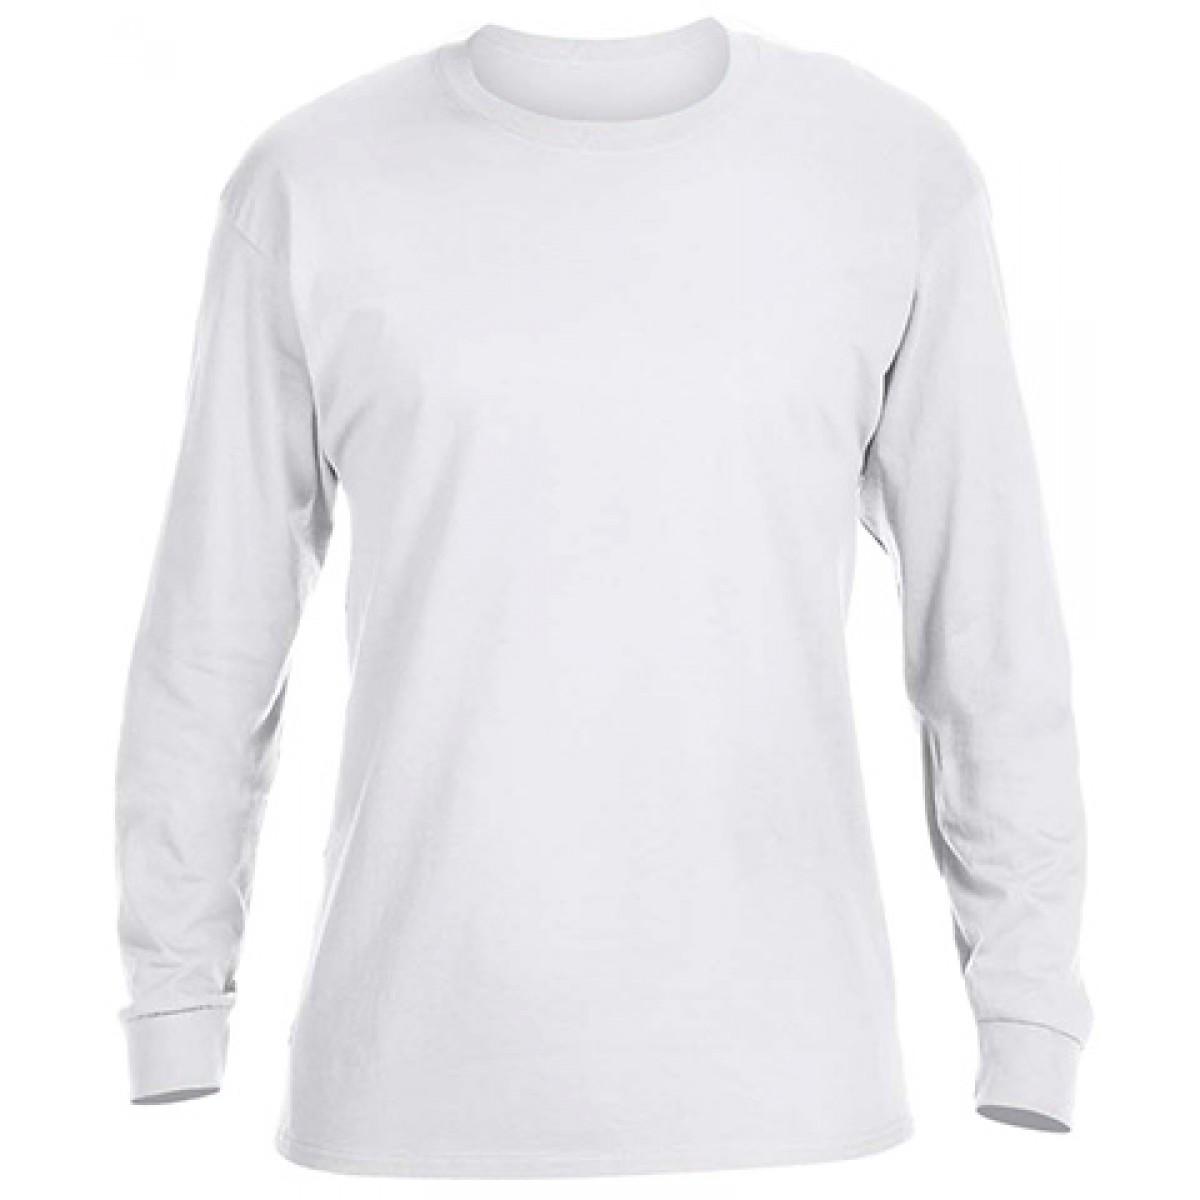 Heavy Cotton Long-Sleeve Adidas Shirt-White-L